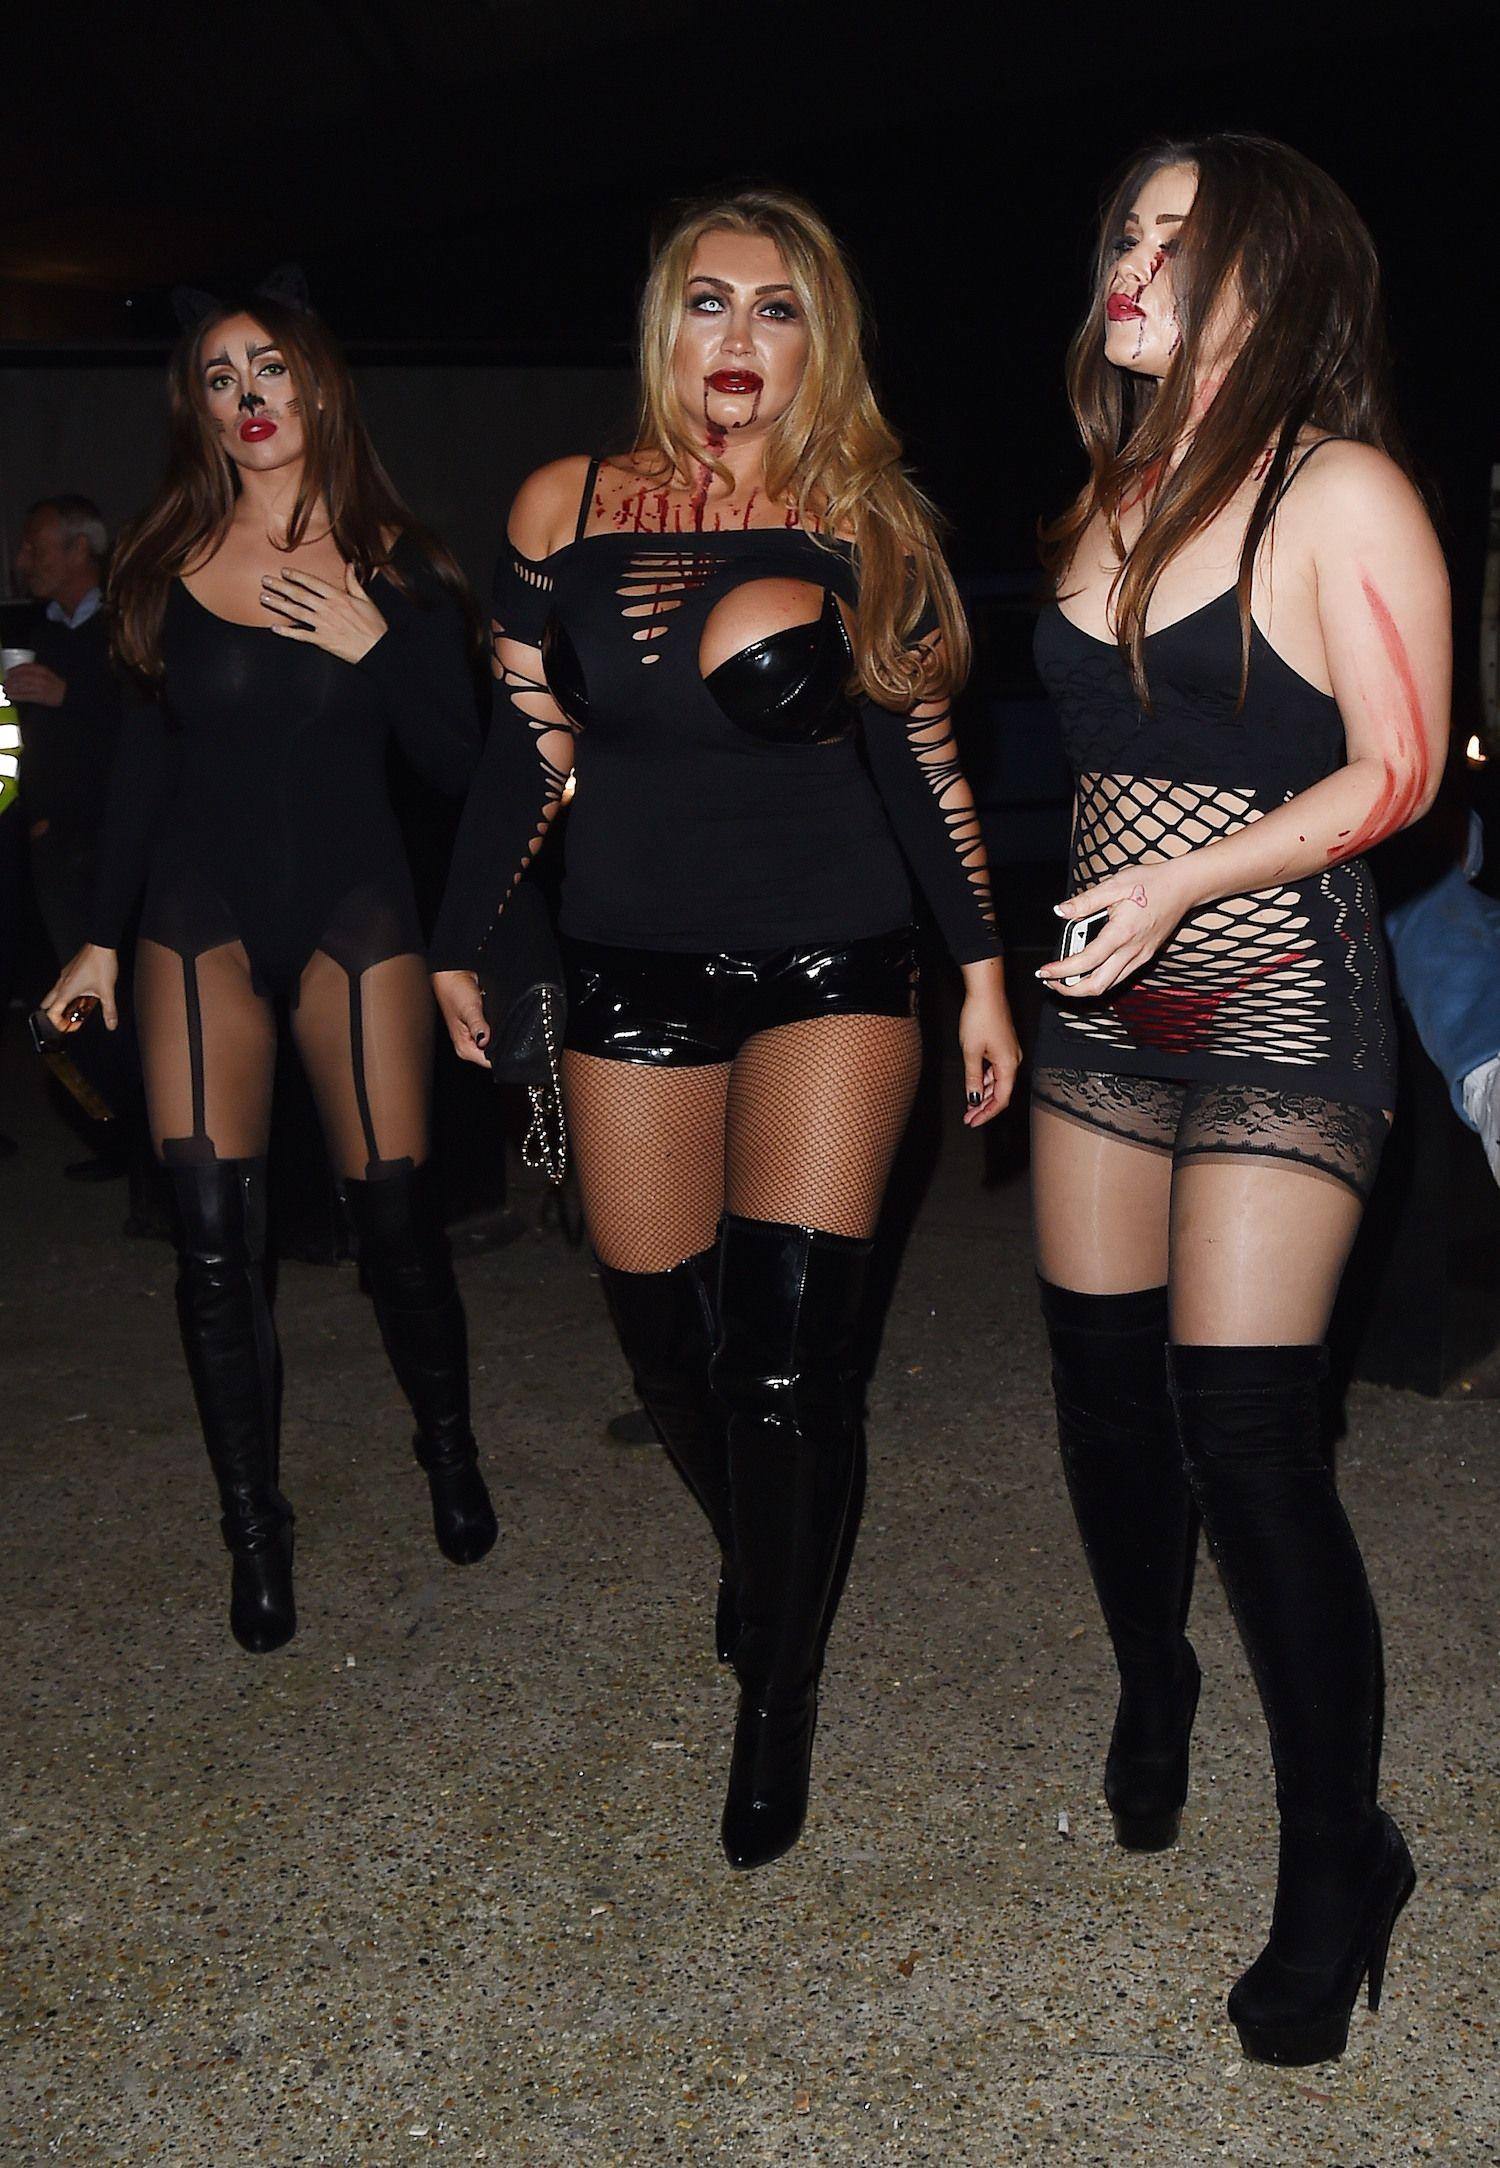 Cleavage Lauren Goodger nudes (95 photos), Ass, Hot, Twitter, braless 2015